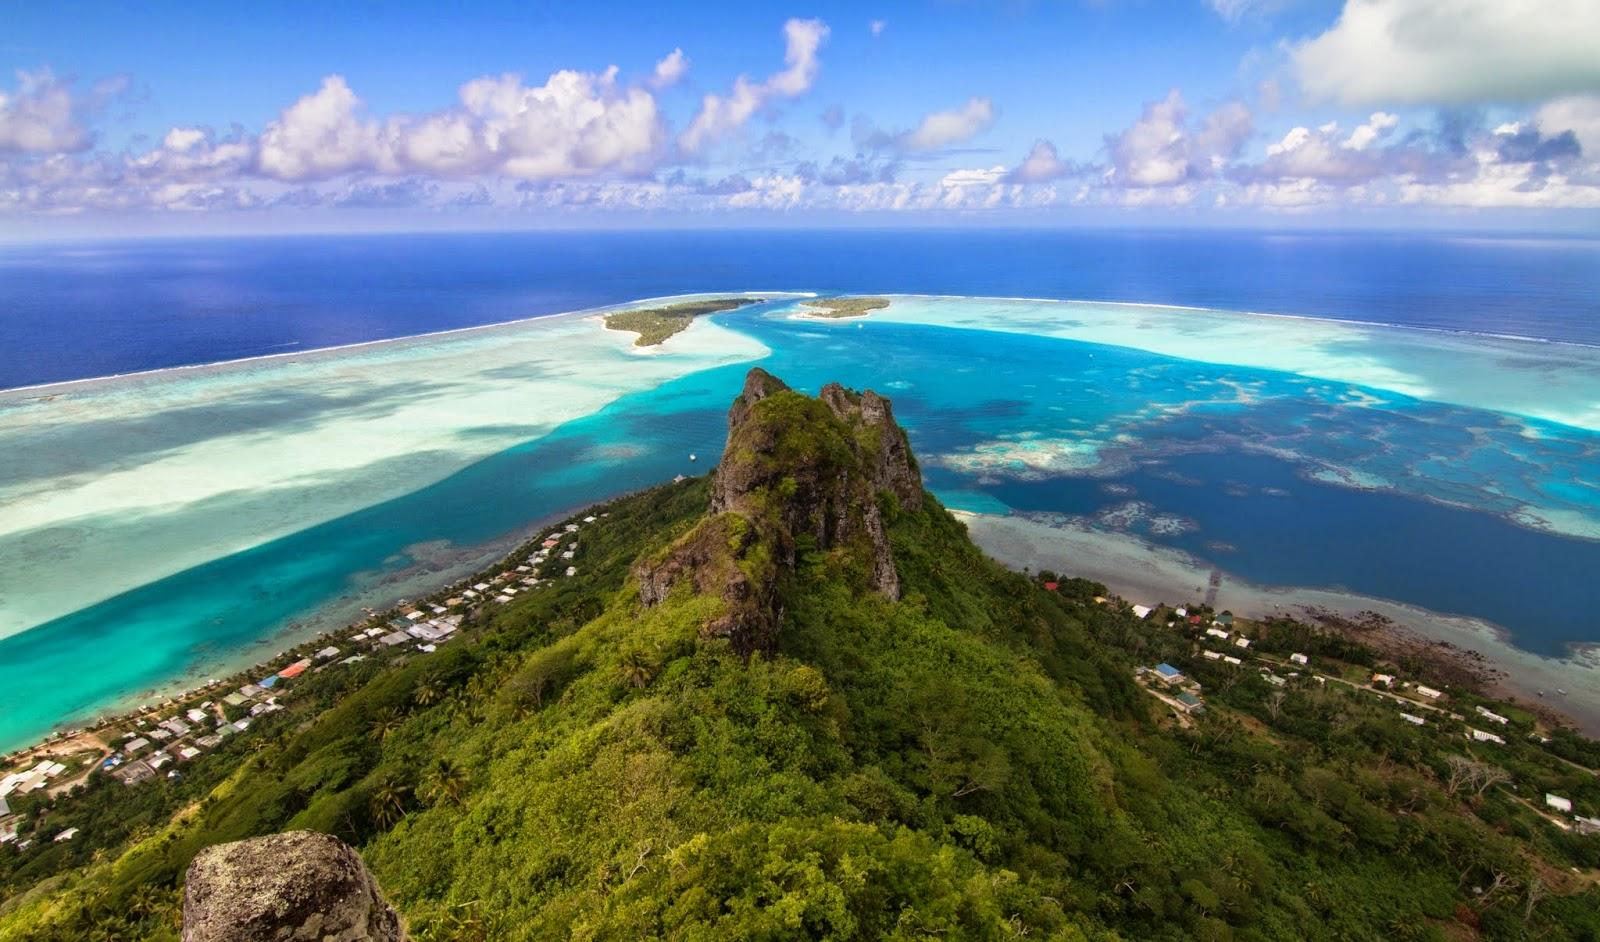 Tahiti French Polynesia  city images : ... French Polynesia, Pacific Papeete, Tahiti, Mo'orea, Bora Bora